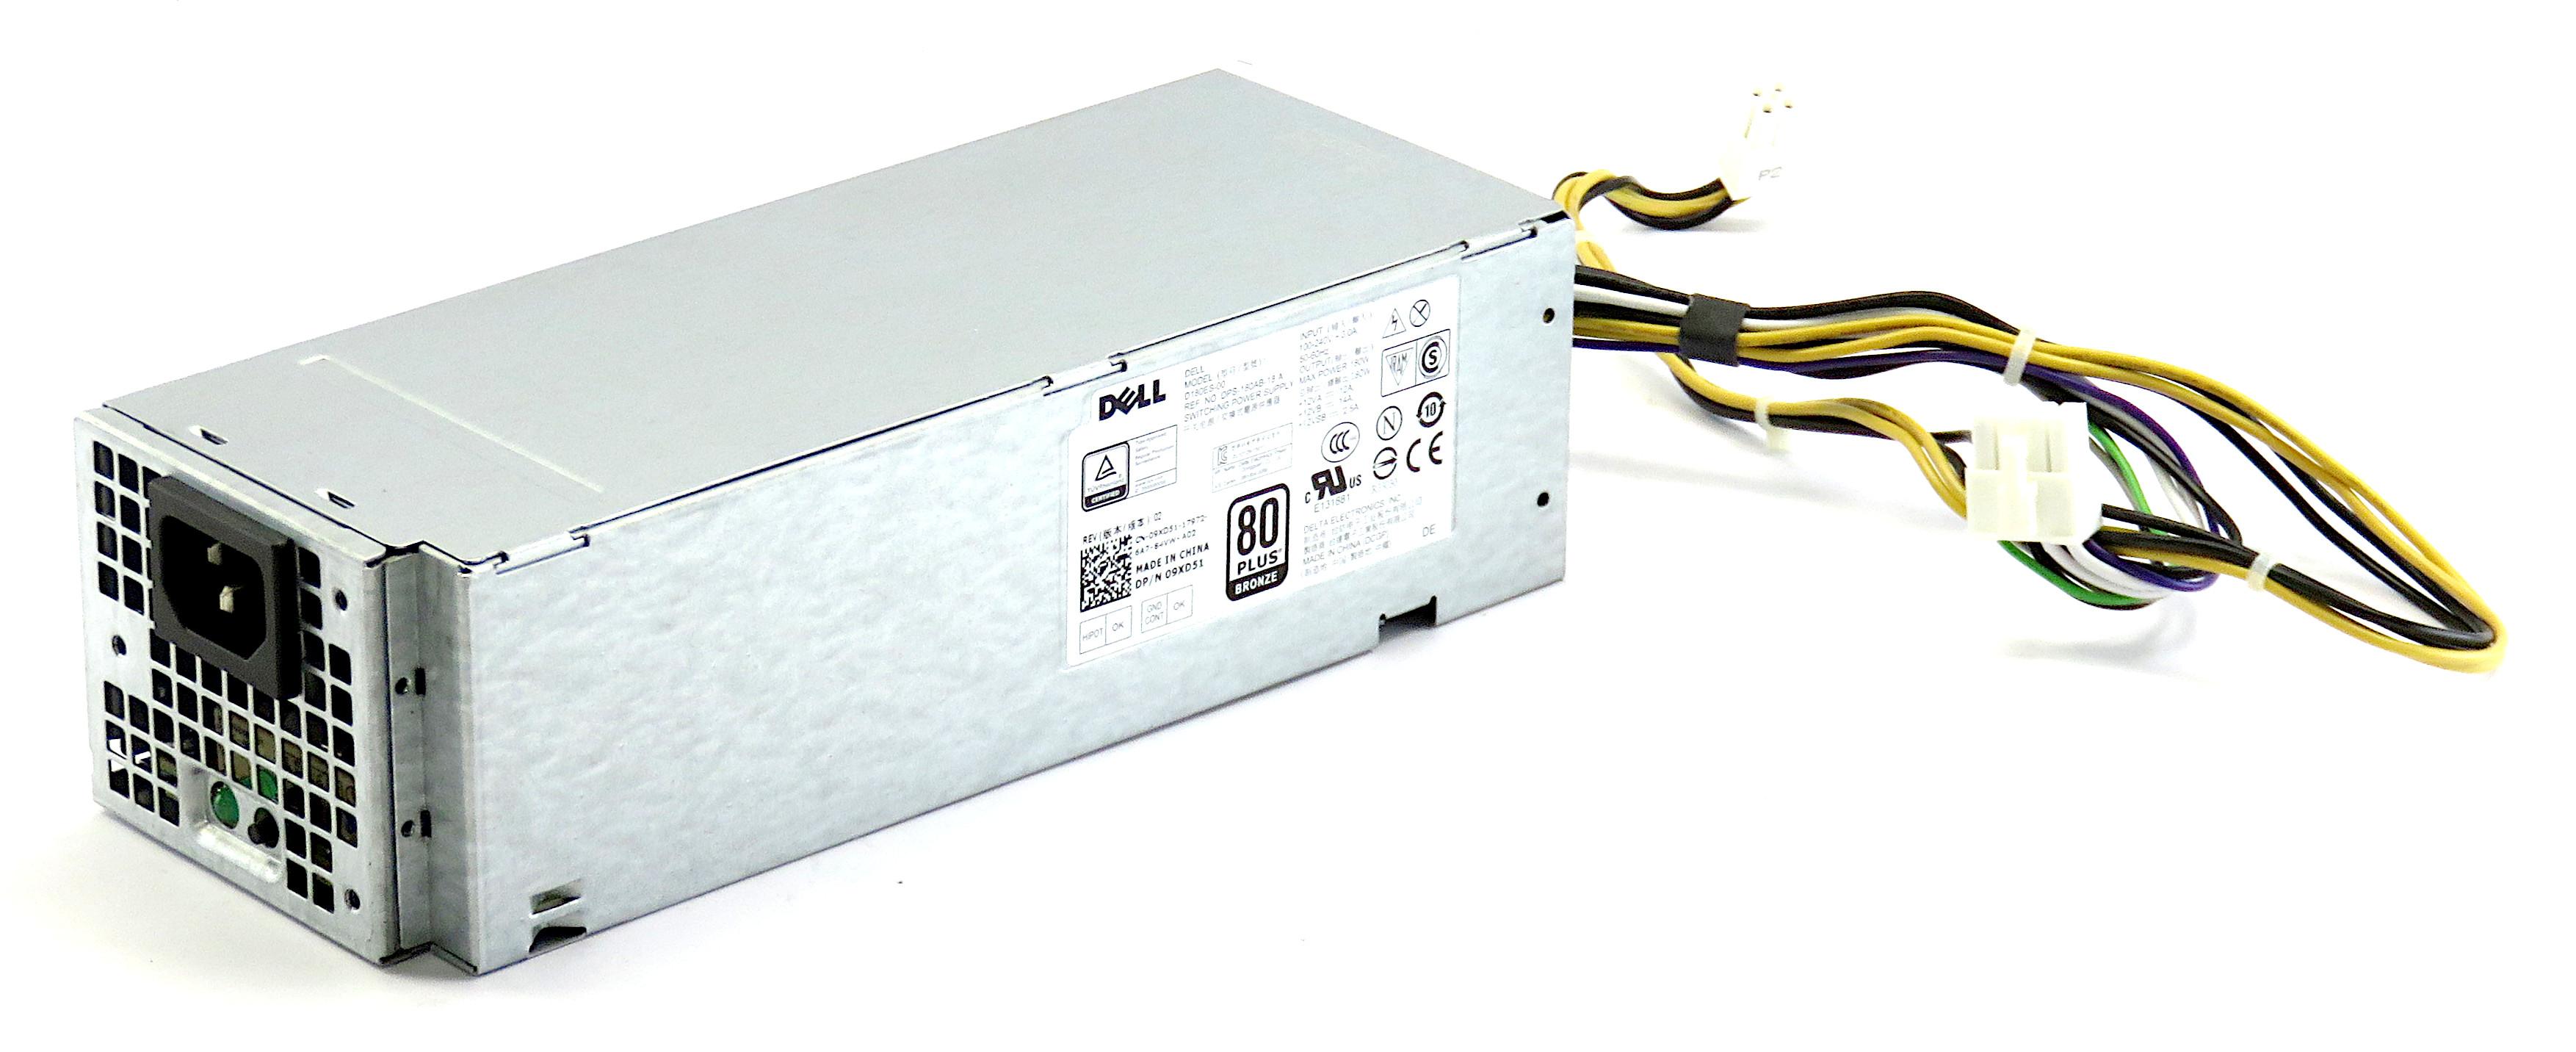 Dell 09XD51 180W 80+ Bronze Power Supply DPS-180AB-18 A f/ OptiPlex 3040 SFF PC